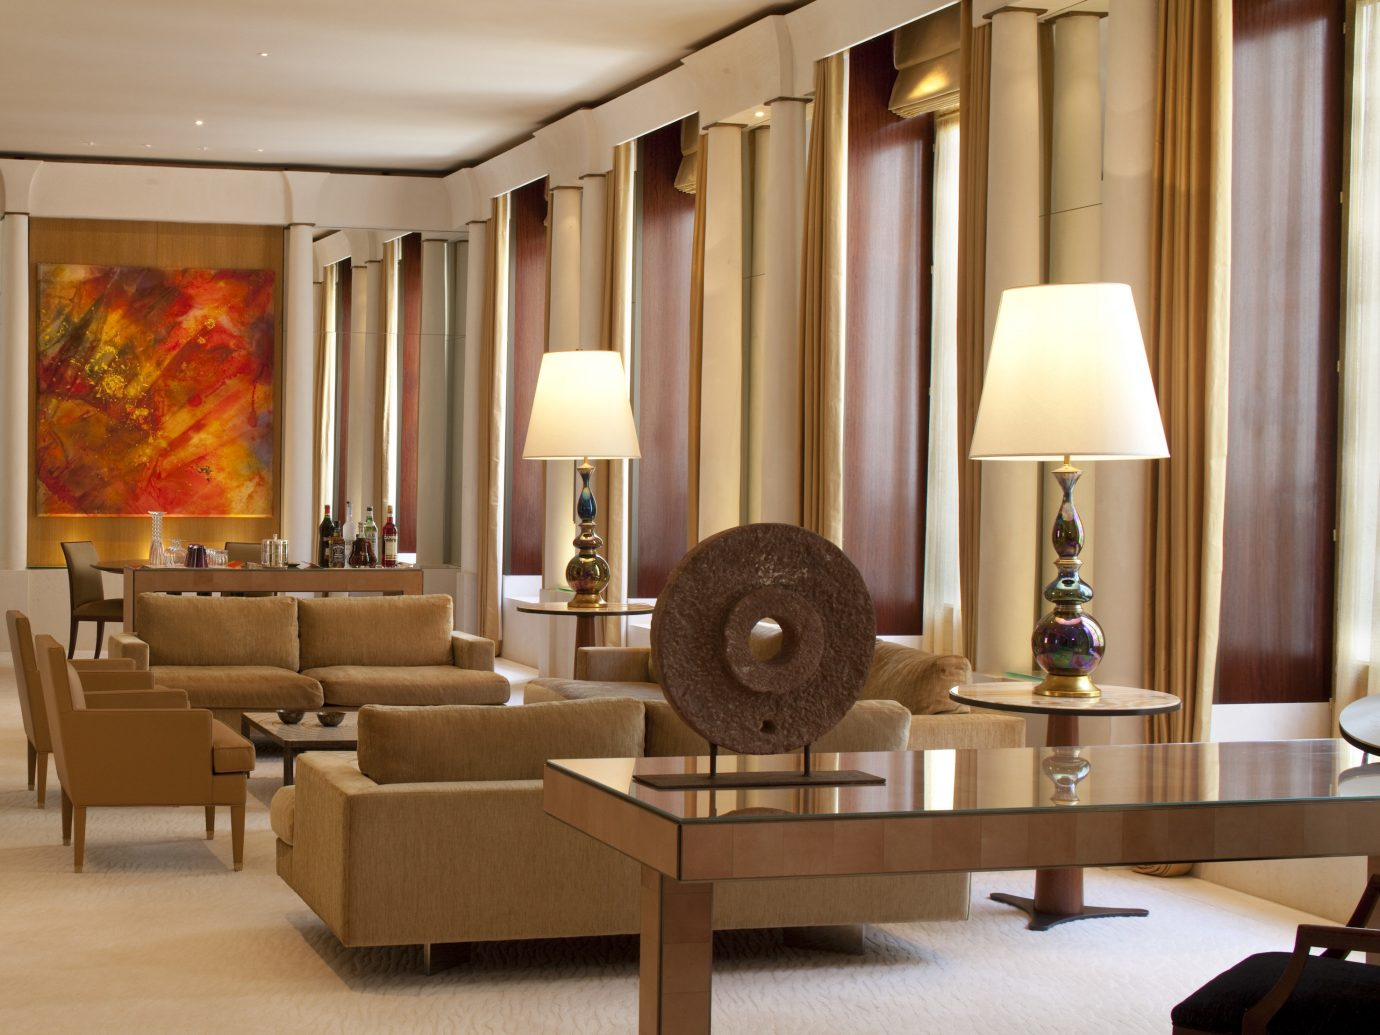 Hotels Luxury Travel floor indoor Living room wall living room interior design ceiling furniture Lobby table Suite interior designer flooring area